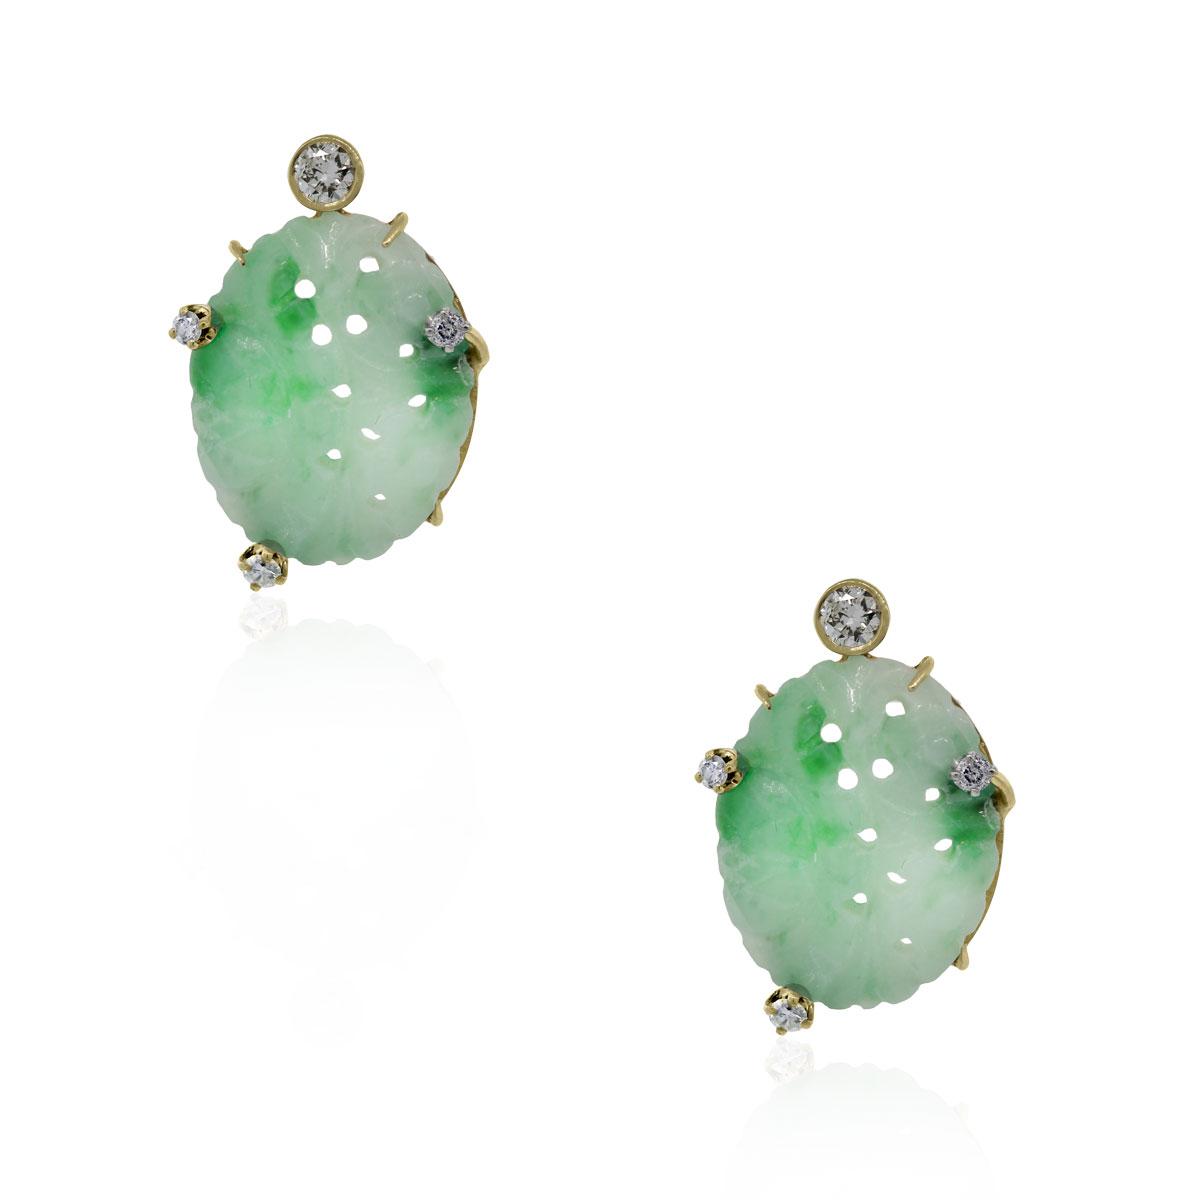 Jade Earrings with 0.20ctw Diamonds in 14k Yellow Gold